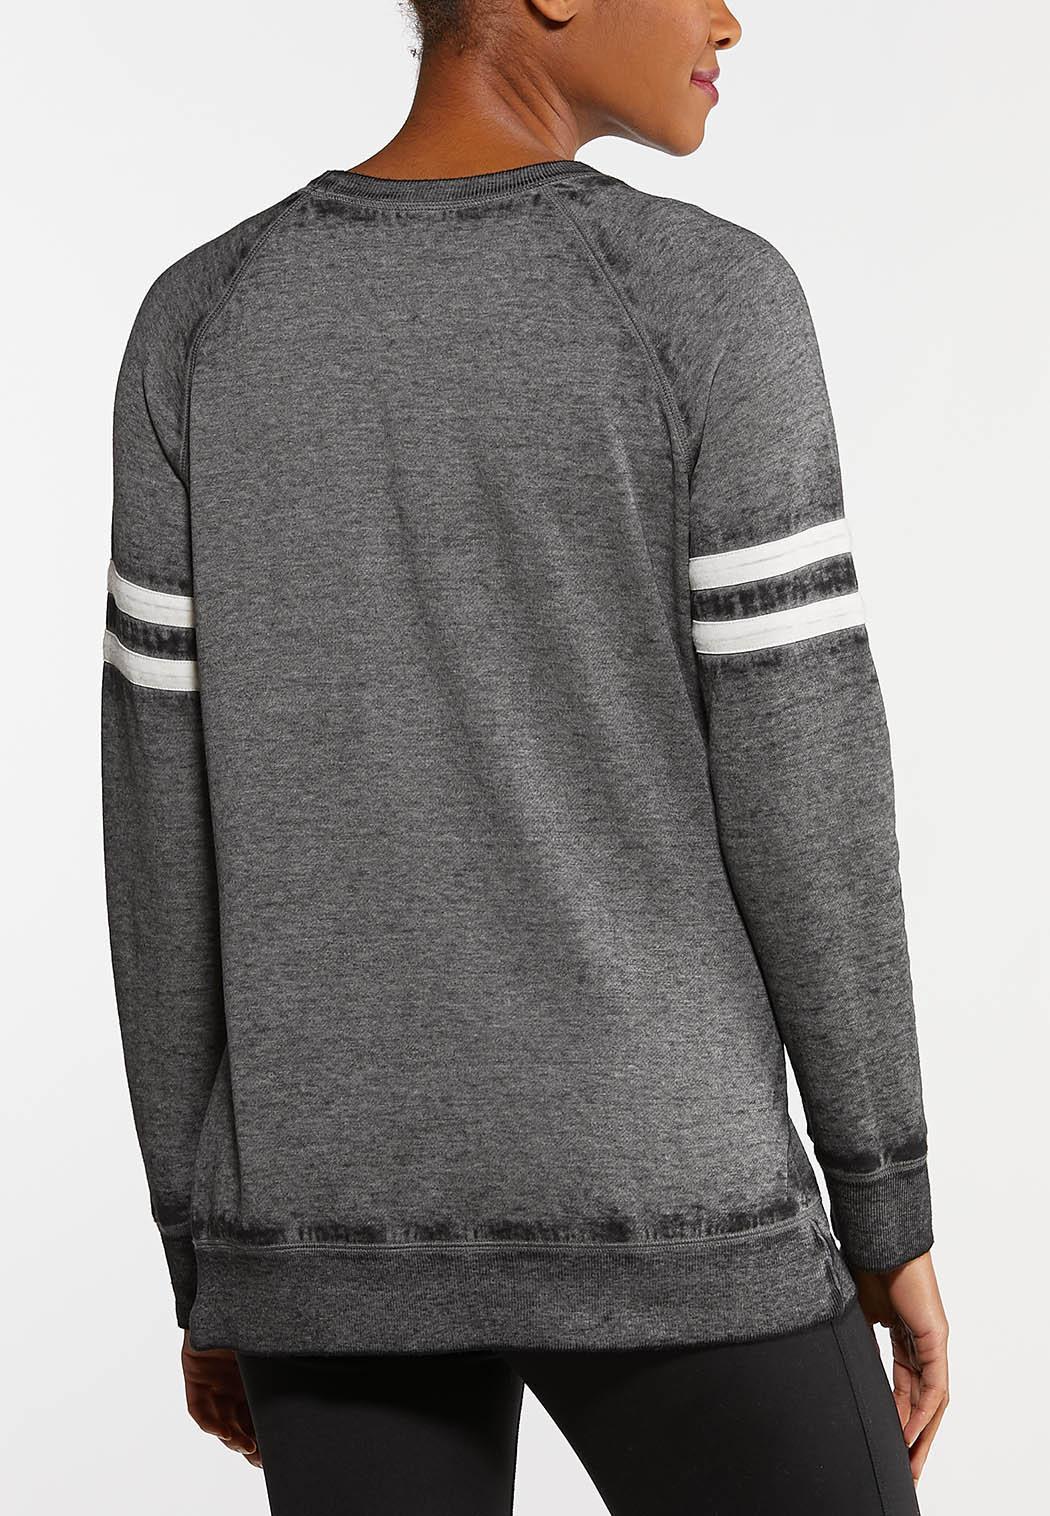 Sport And Sparkle Sweatshirt (Item #44102860)